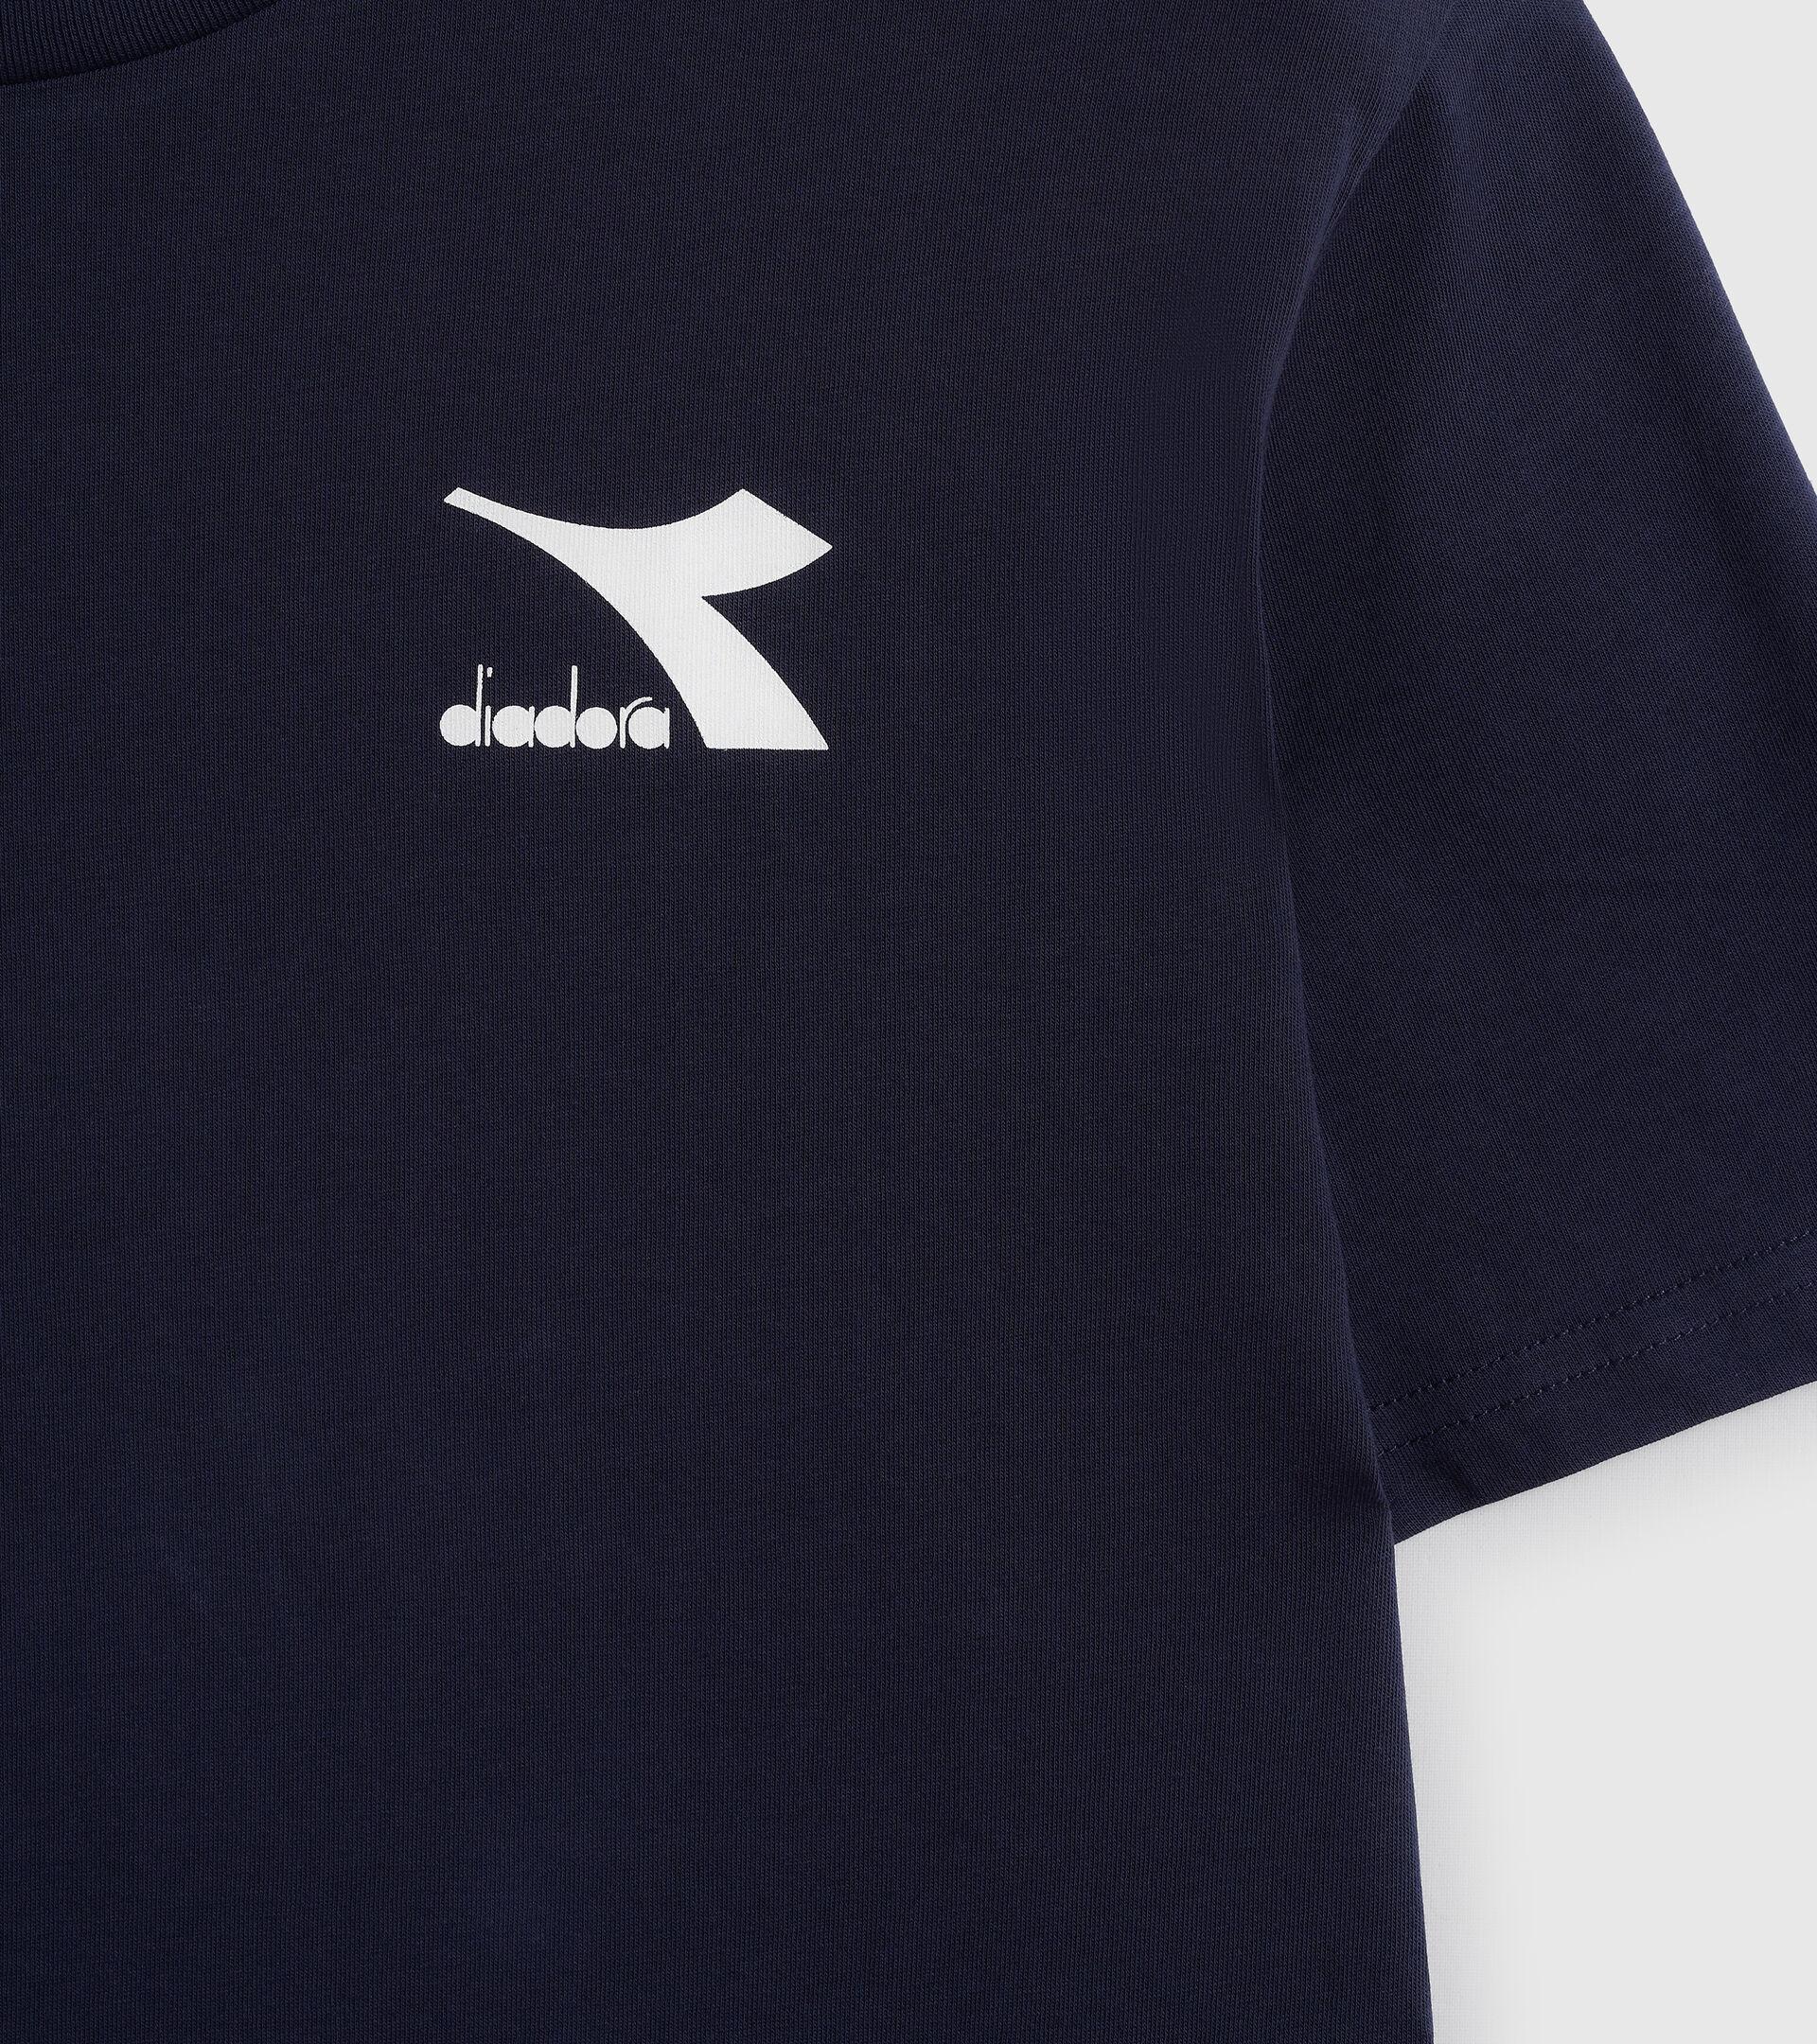 T-shirt - Men T-SHIRT SS CHROMIA CLASSIC NAVY - Diadora